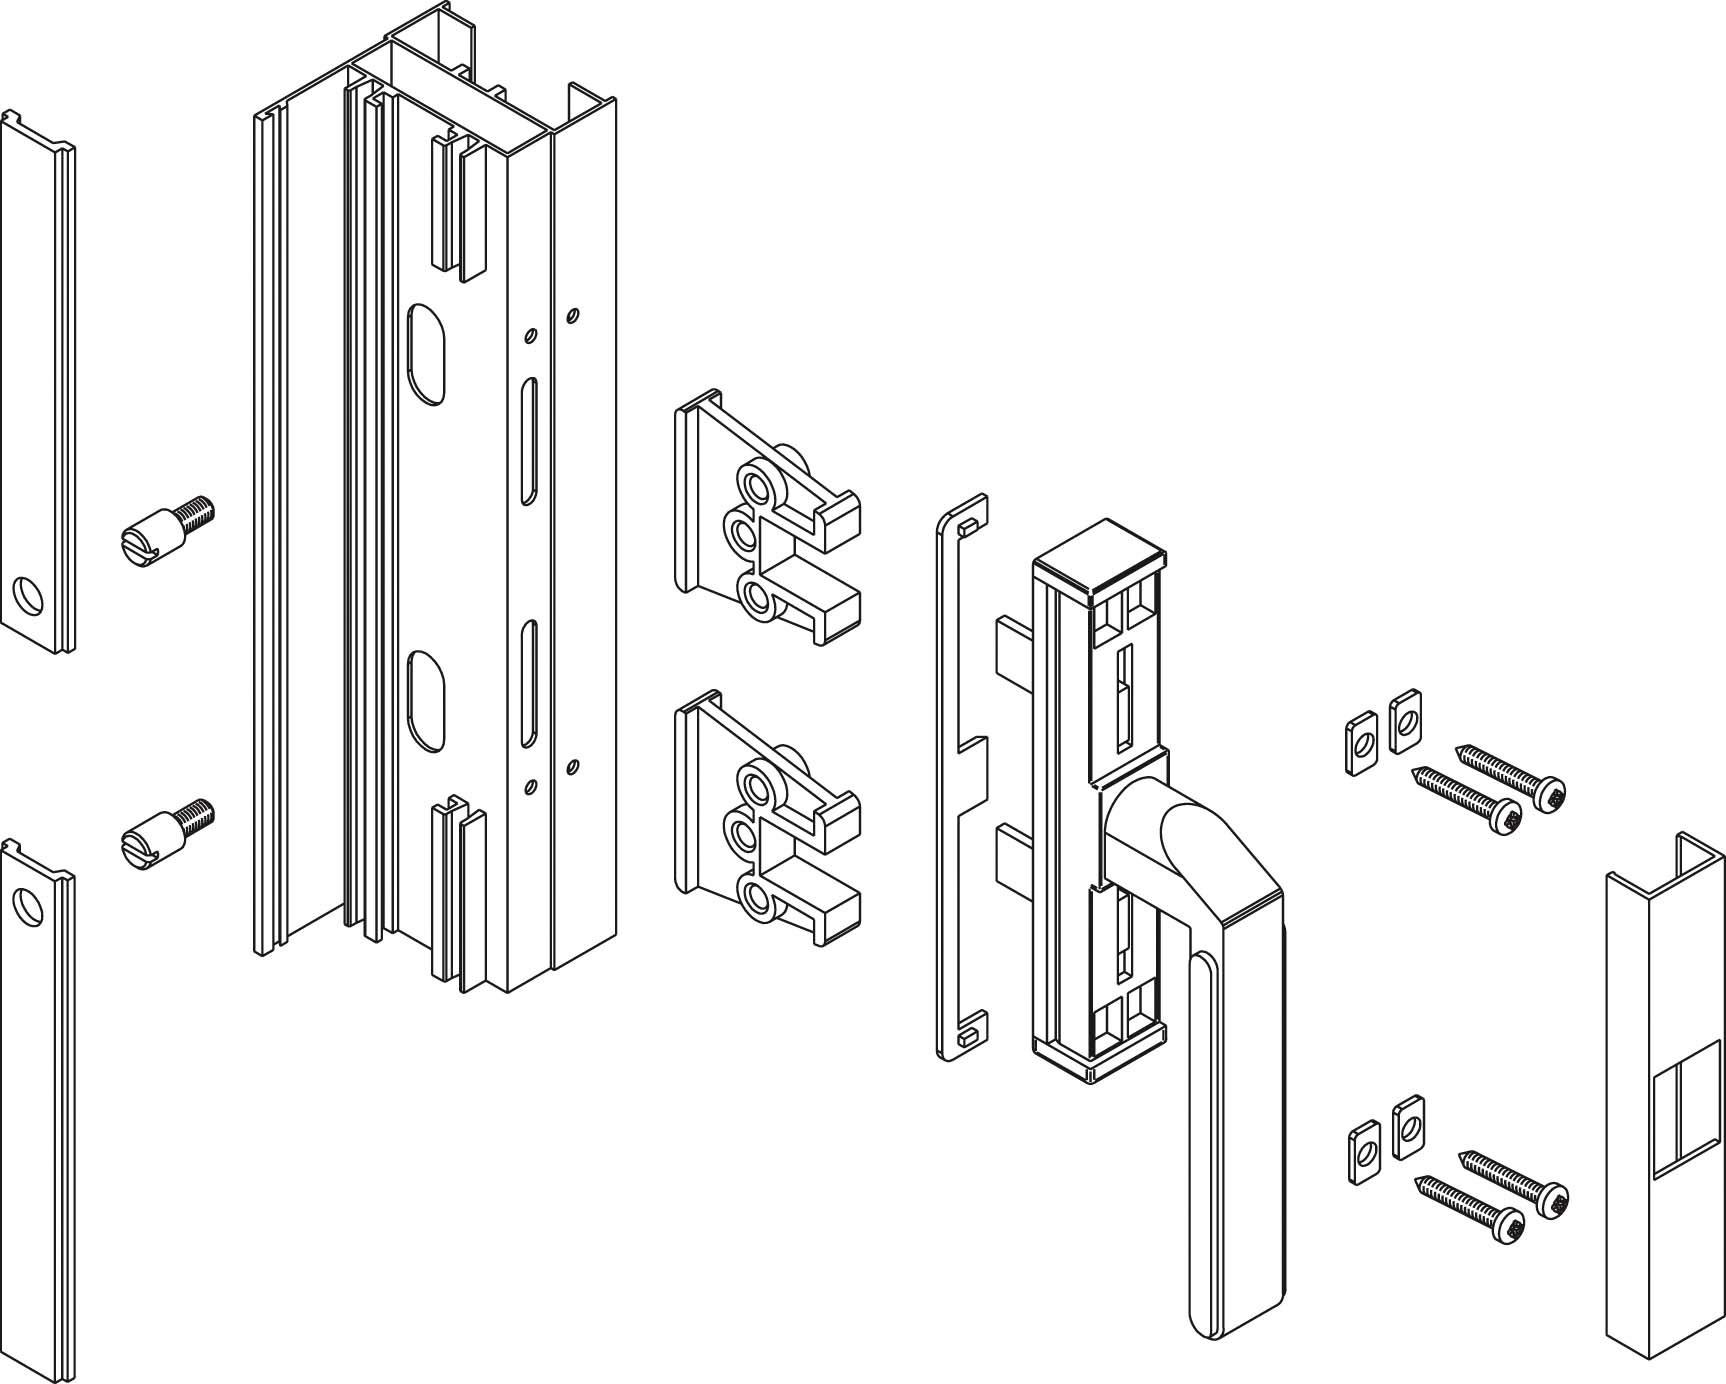 Nova giesse maniglie cremonesi kit collegamento windowo for Scheda tecnica anta ribalta giesse